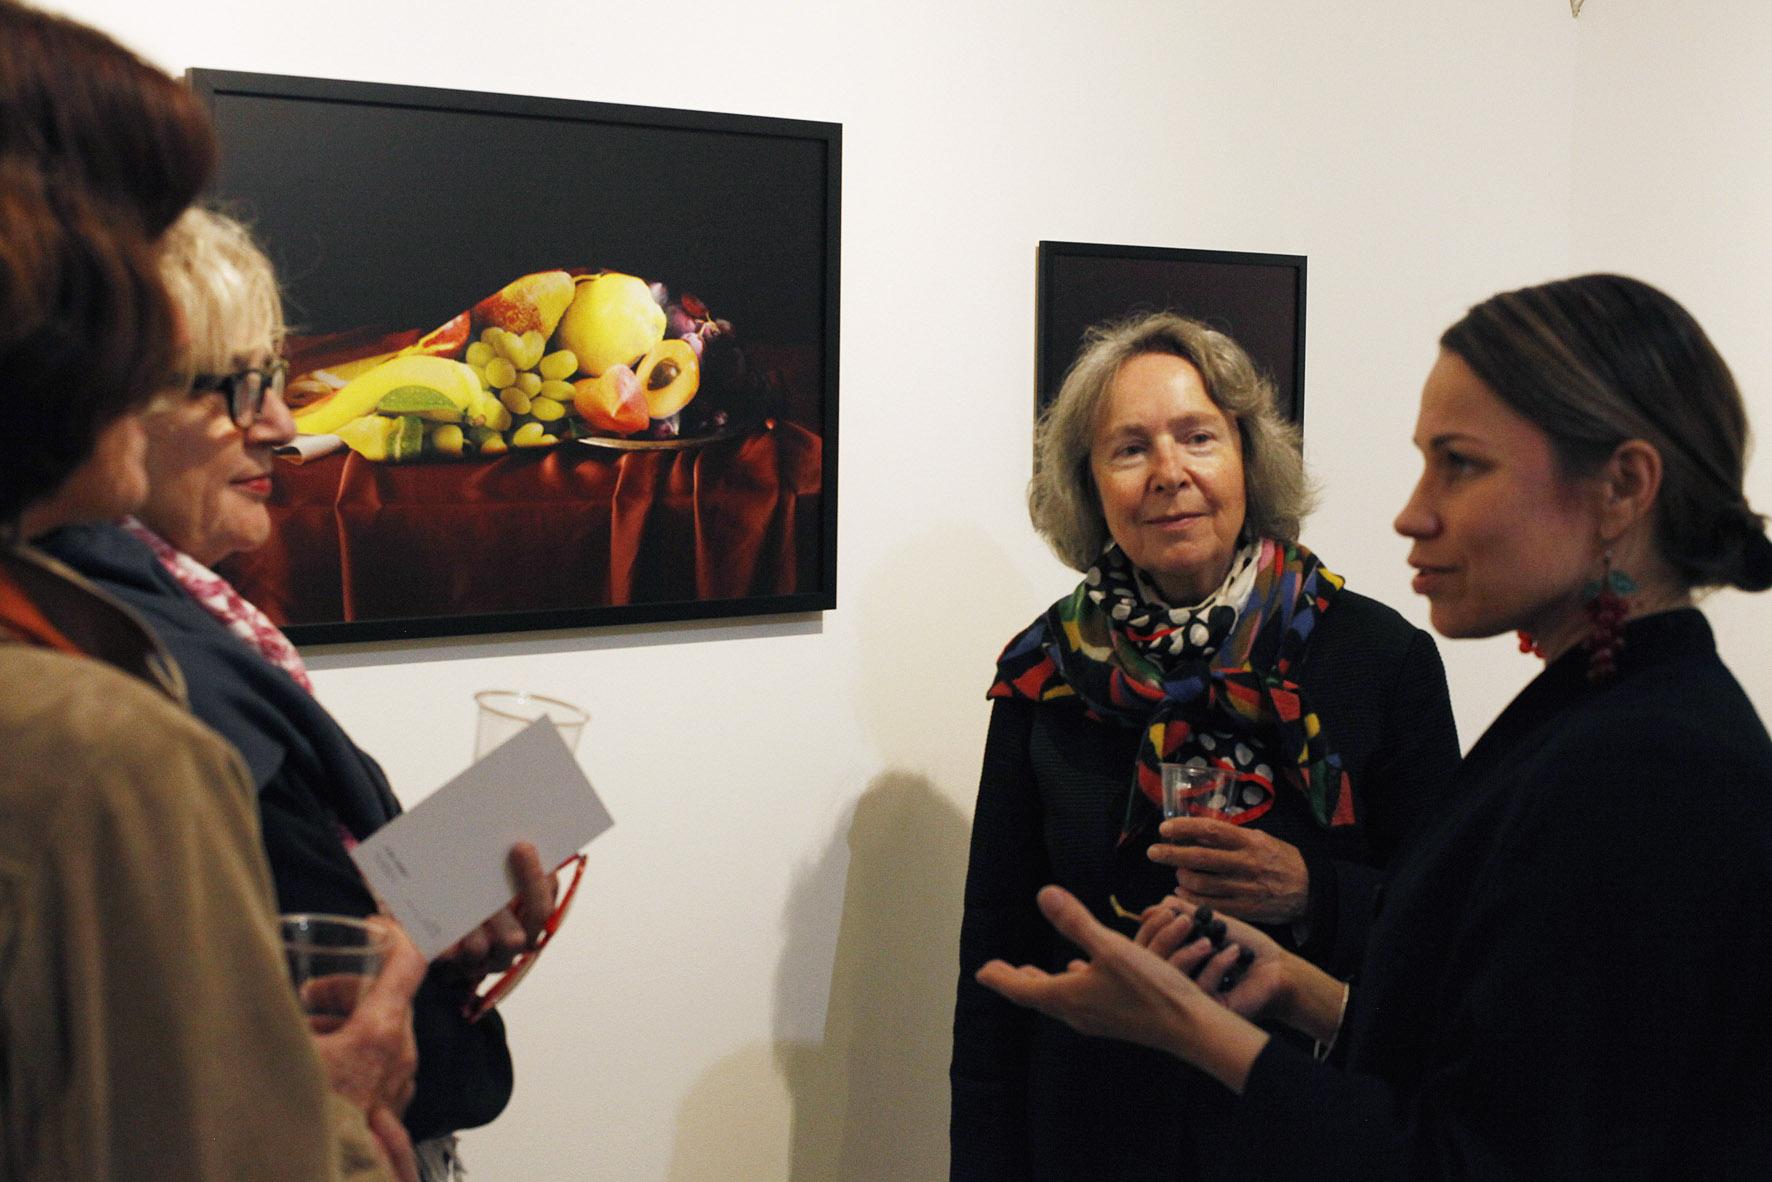 21st Century Still Life- exhibition at Galerie Le Magasin de Jouets, Arles, France.